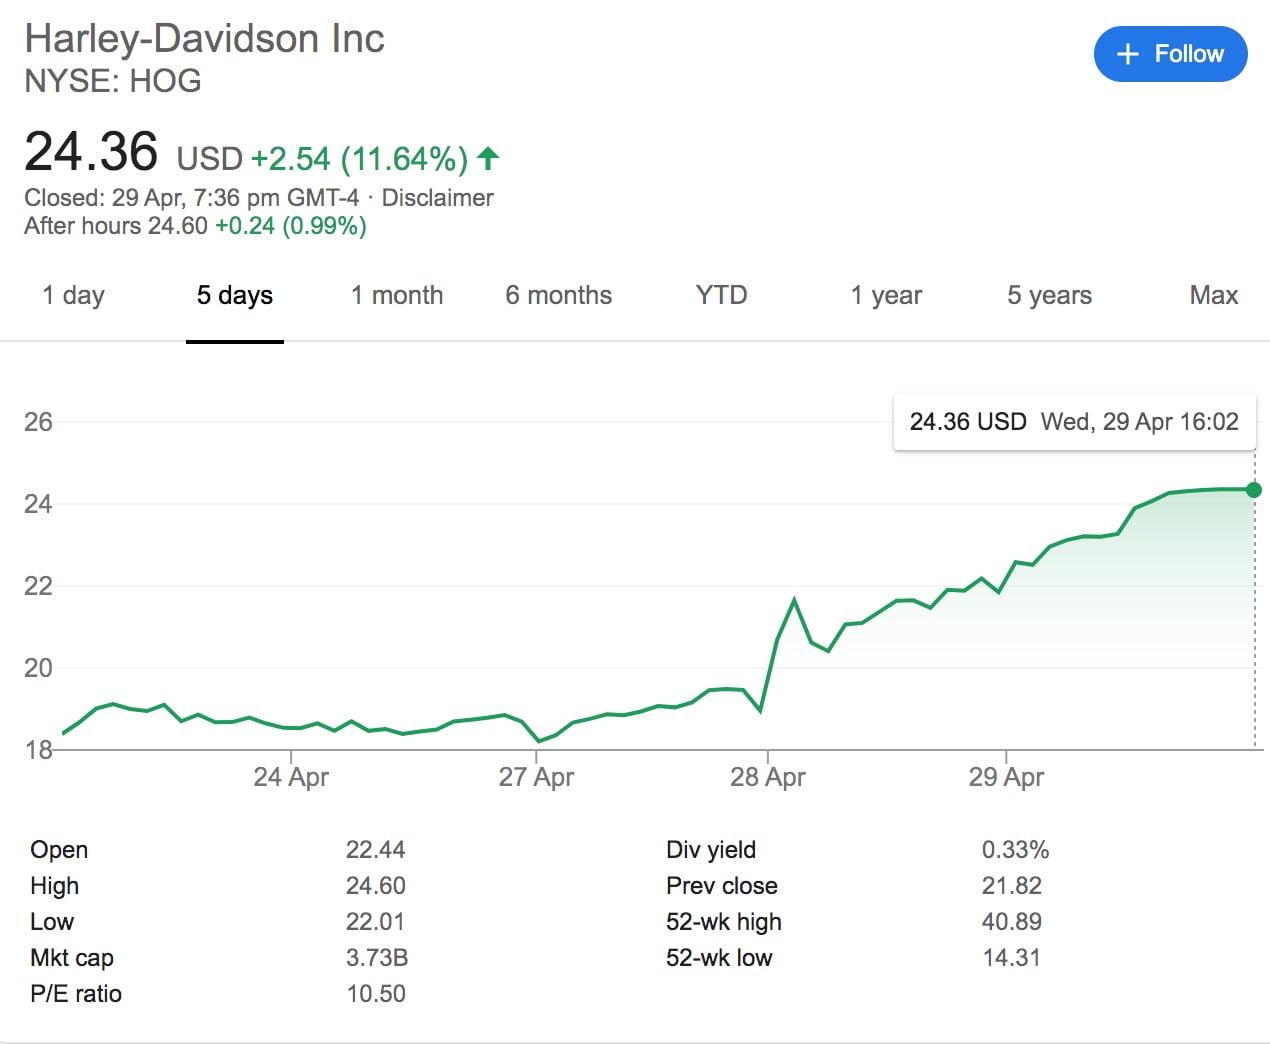 Harley-Davidson Stock Shoots Up